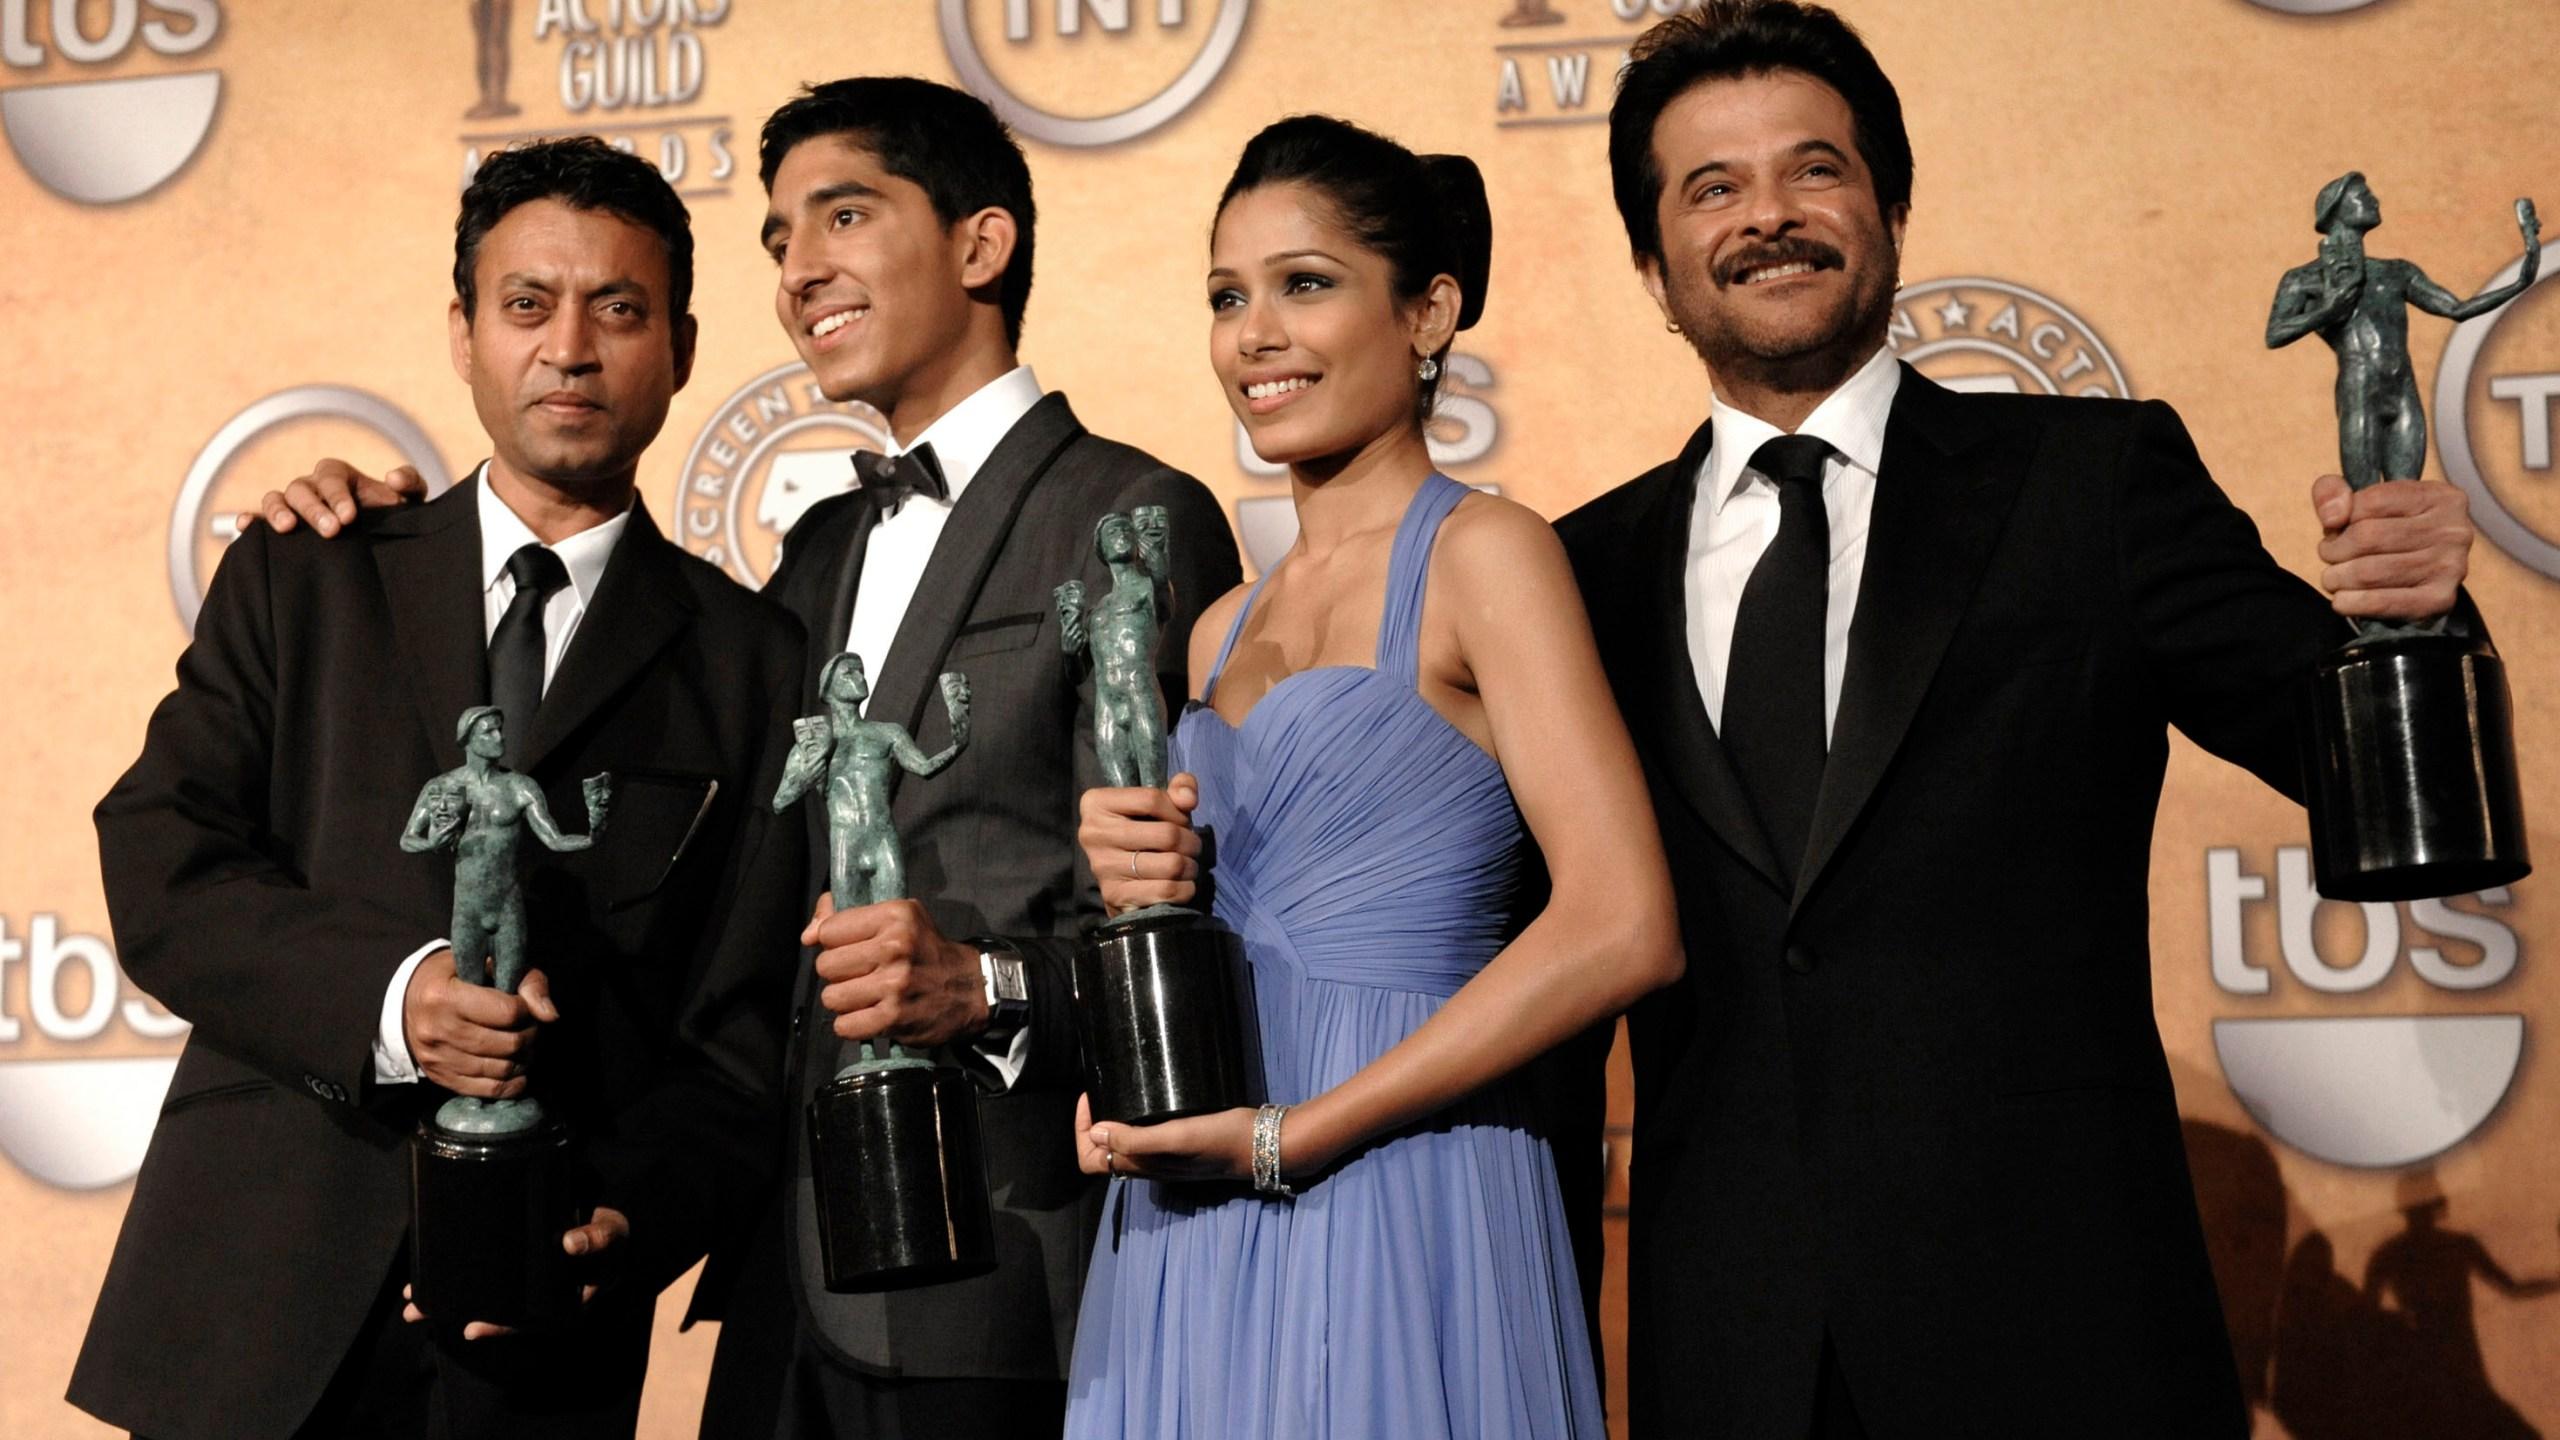 Irrfan Khan, Dev Patel, Freida Pinto, Anil Kapoor.